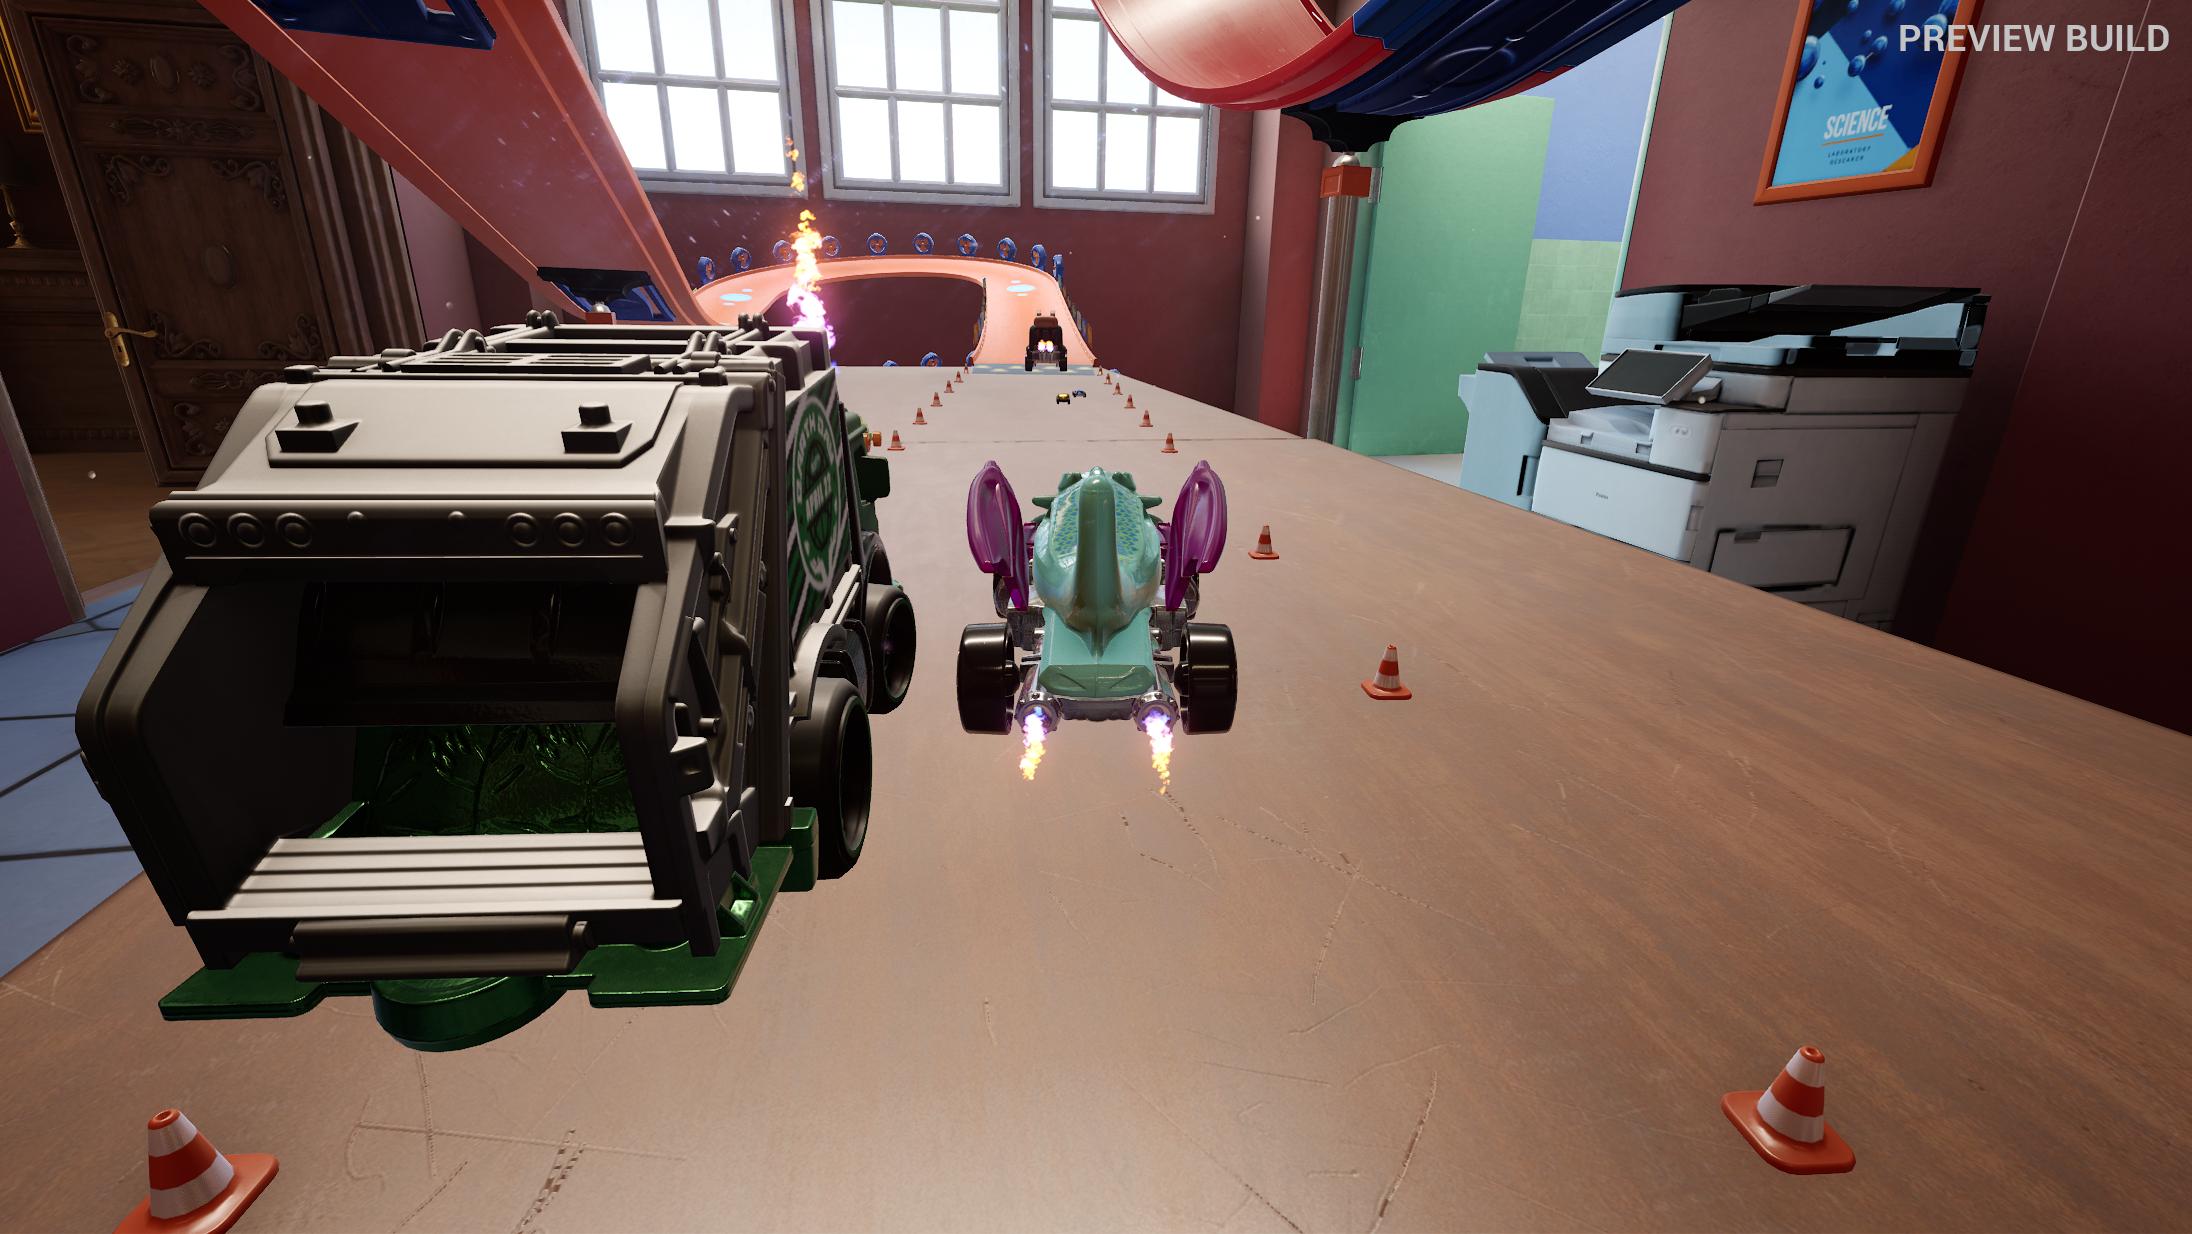 Hotwheels Screenshot 2021.06.25 - 12.10.06.36